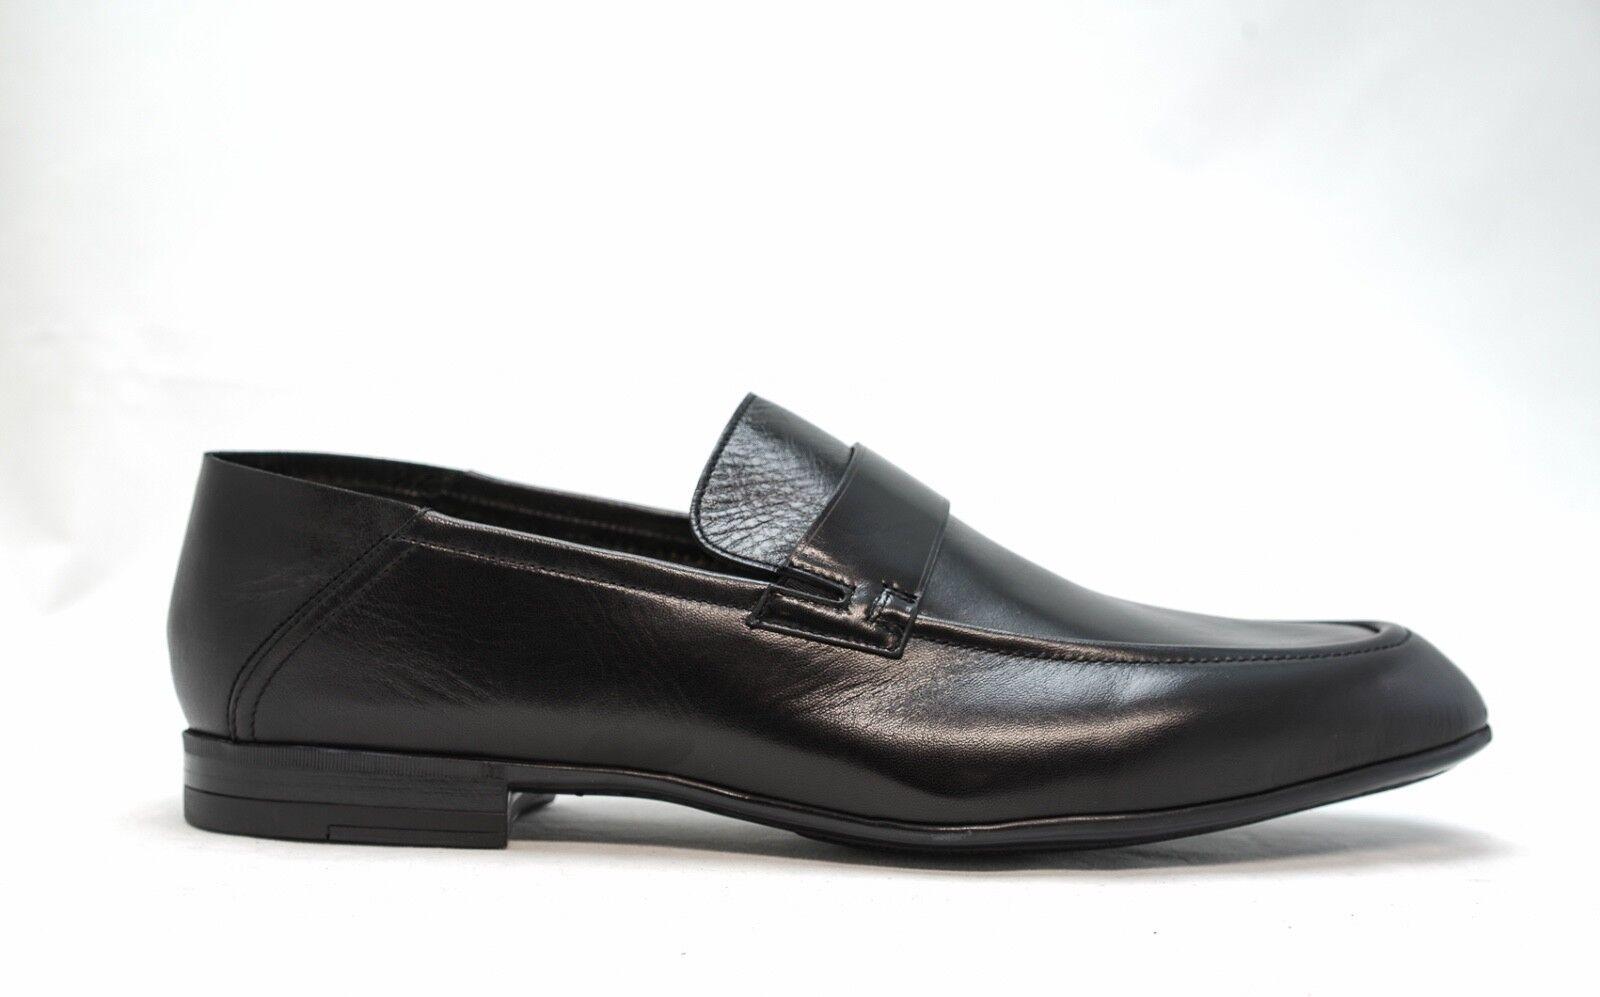 Fabi Men's Black Leather Slip On Loafer 8940A New in Box